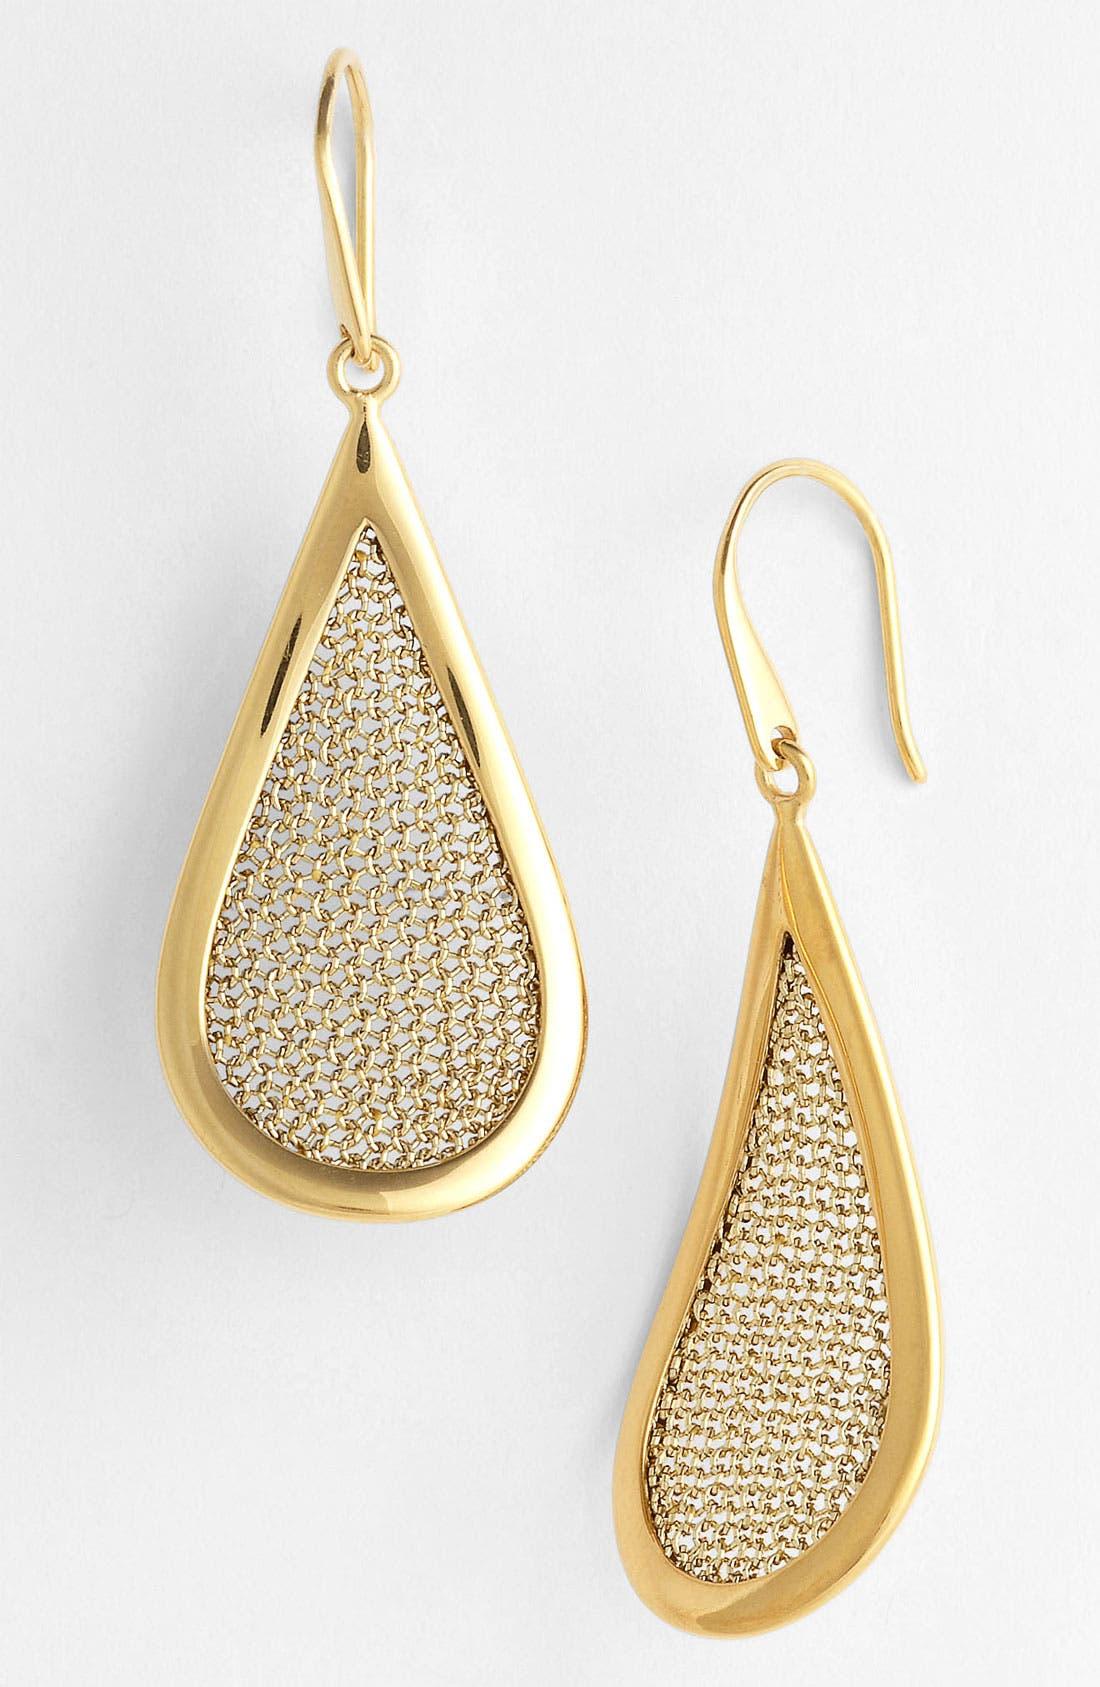 Main Image - Adami & Martucci Teardrop Earrings